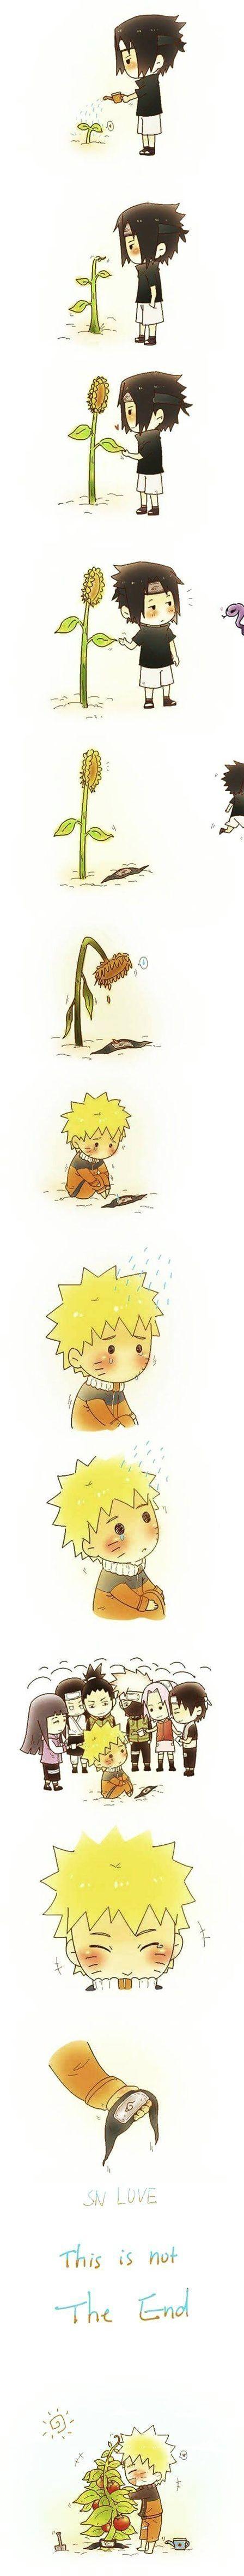 Naruto and Sasuke: Fun fact, Naruto at the end is probably growing tomatoes because Sasuke loves tomatoes.